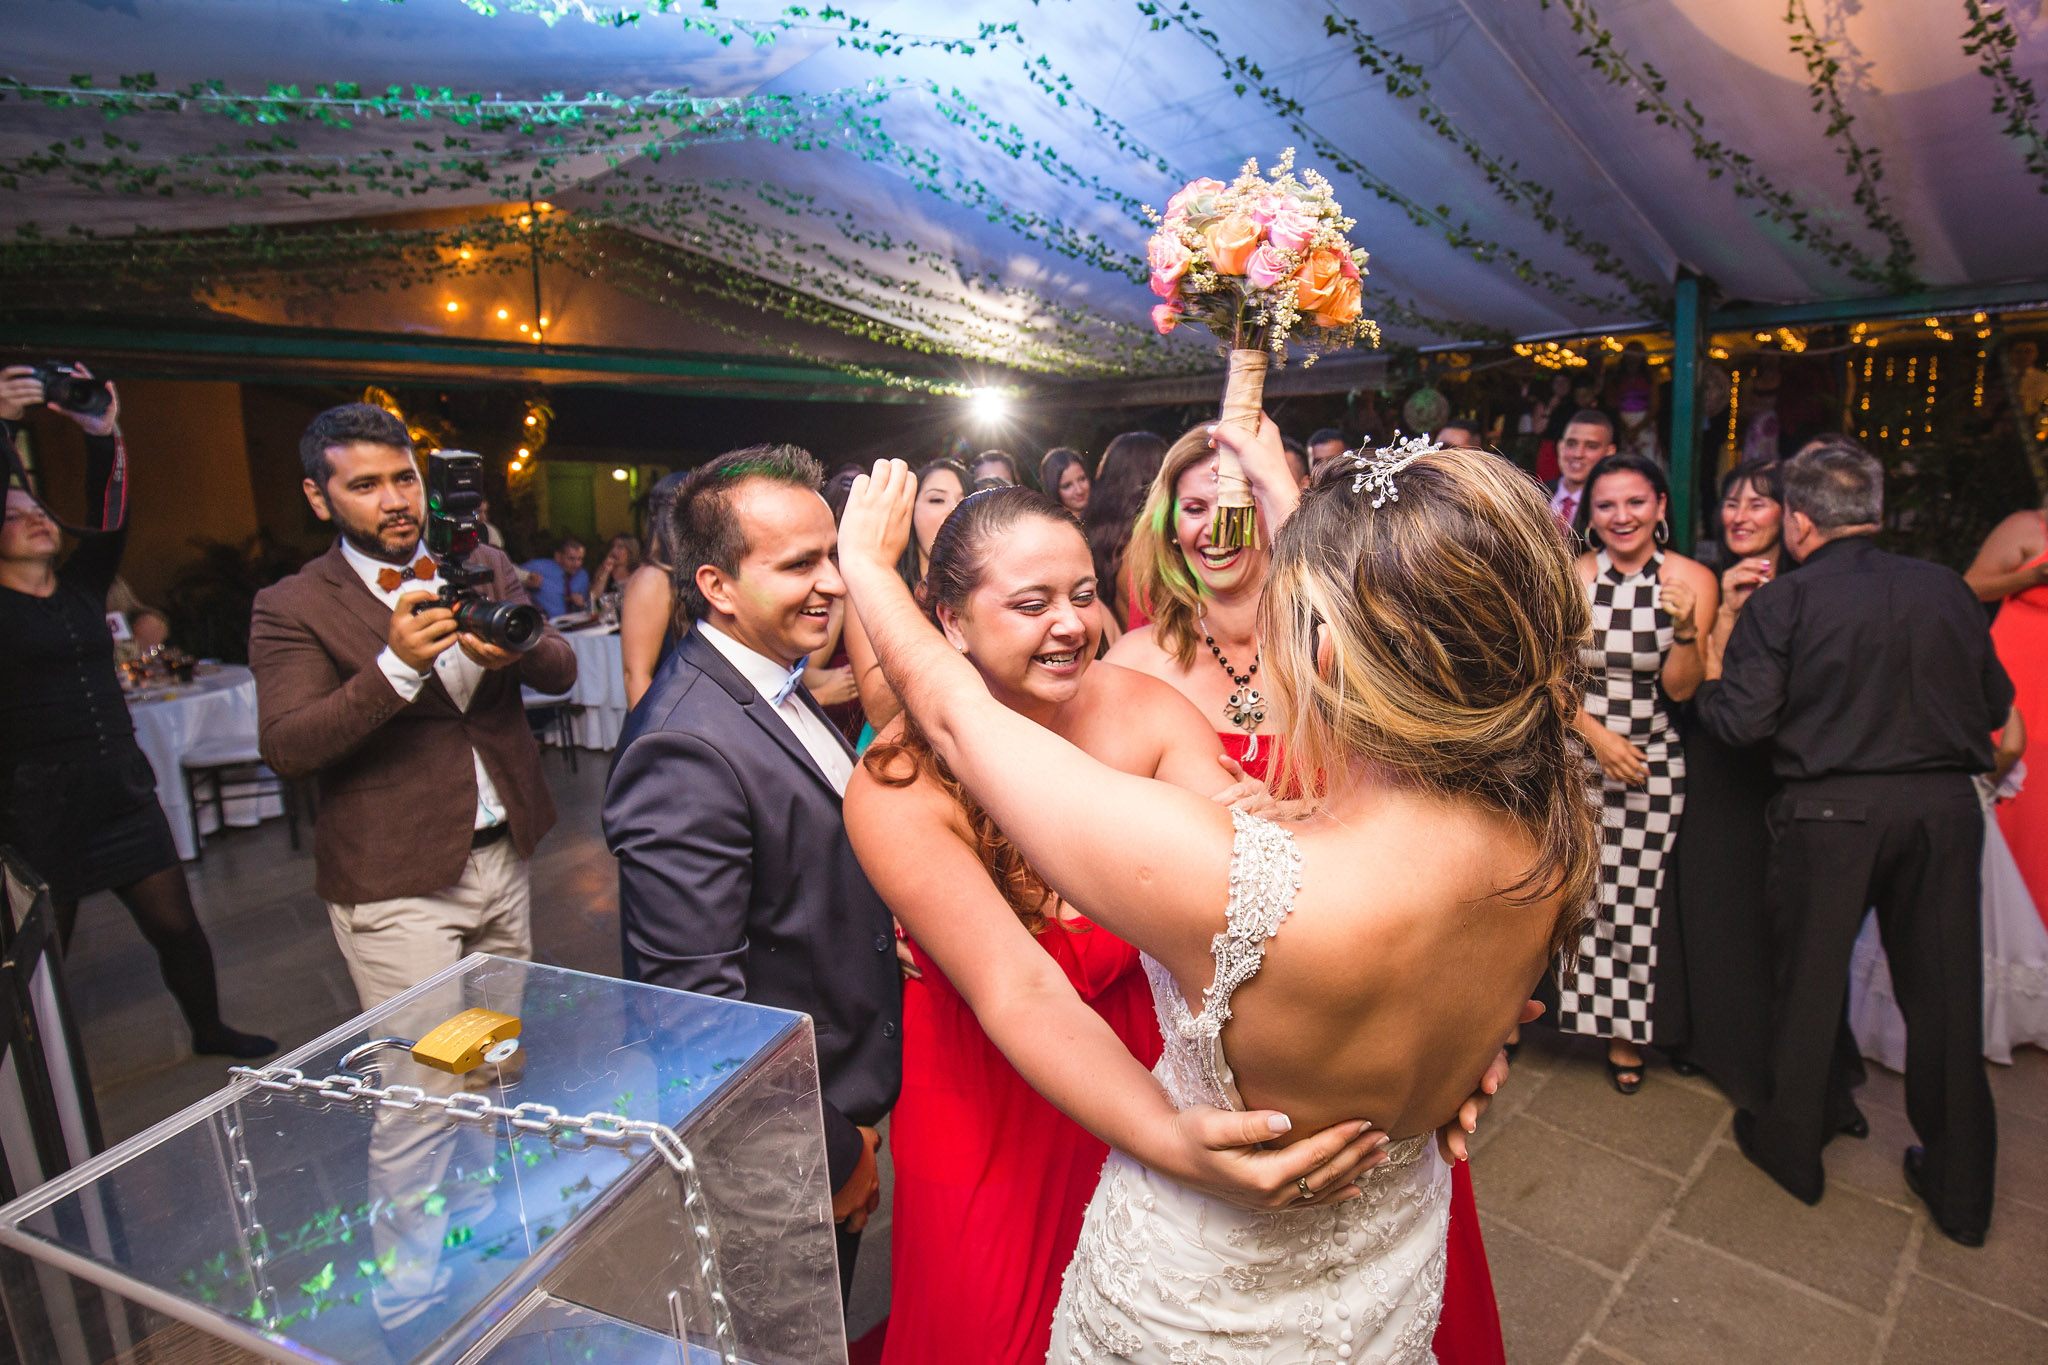 wedding-travellers-destination-wedding-photography-colombia-medellin-chuscalito-bouquet-toss-alternative-locked-box-key